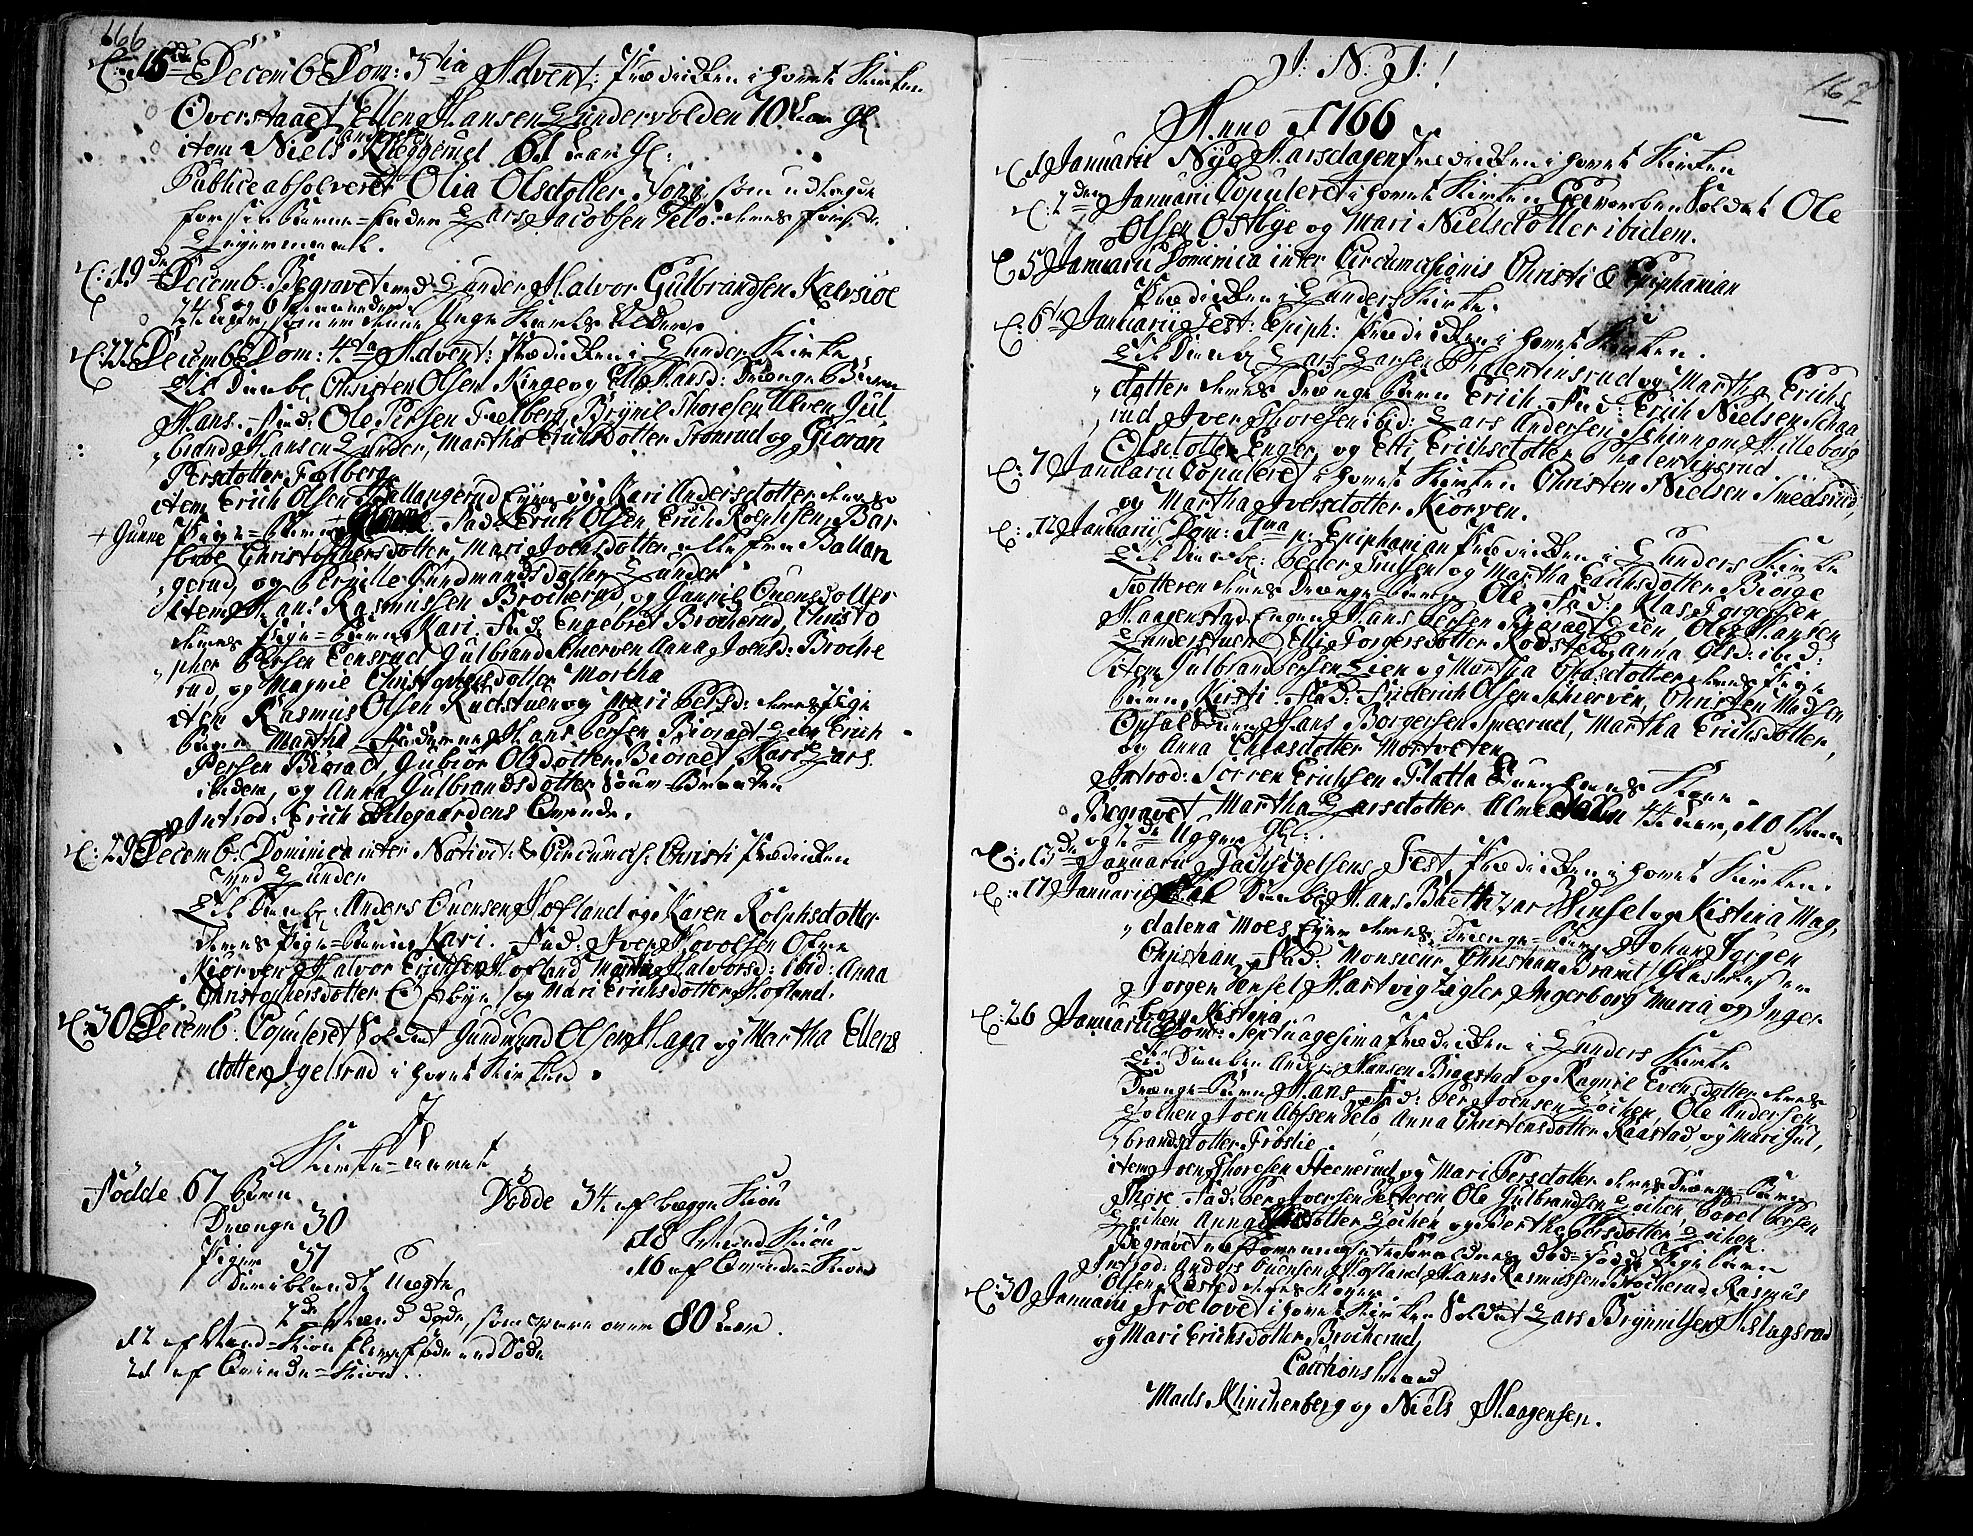 SAH, Jevnaker prestekontor, Ministerialbok nr. 3, 1752-1799, s. 166-167